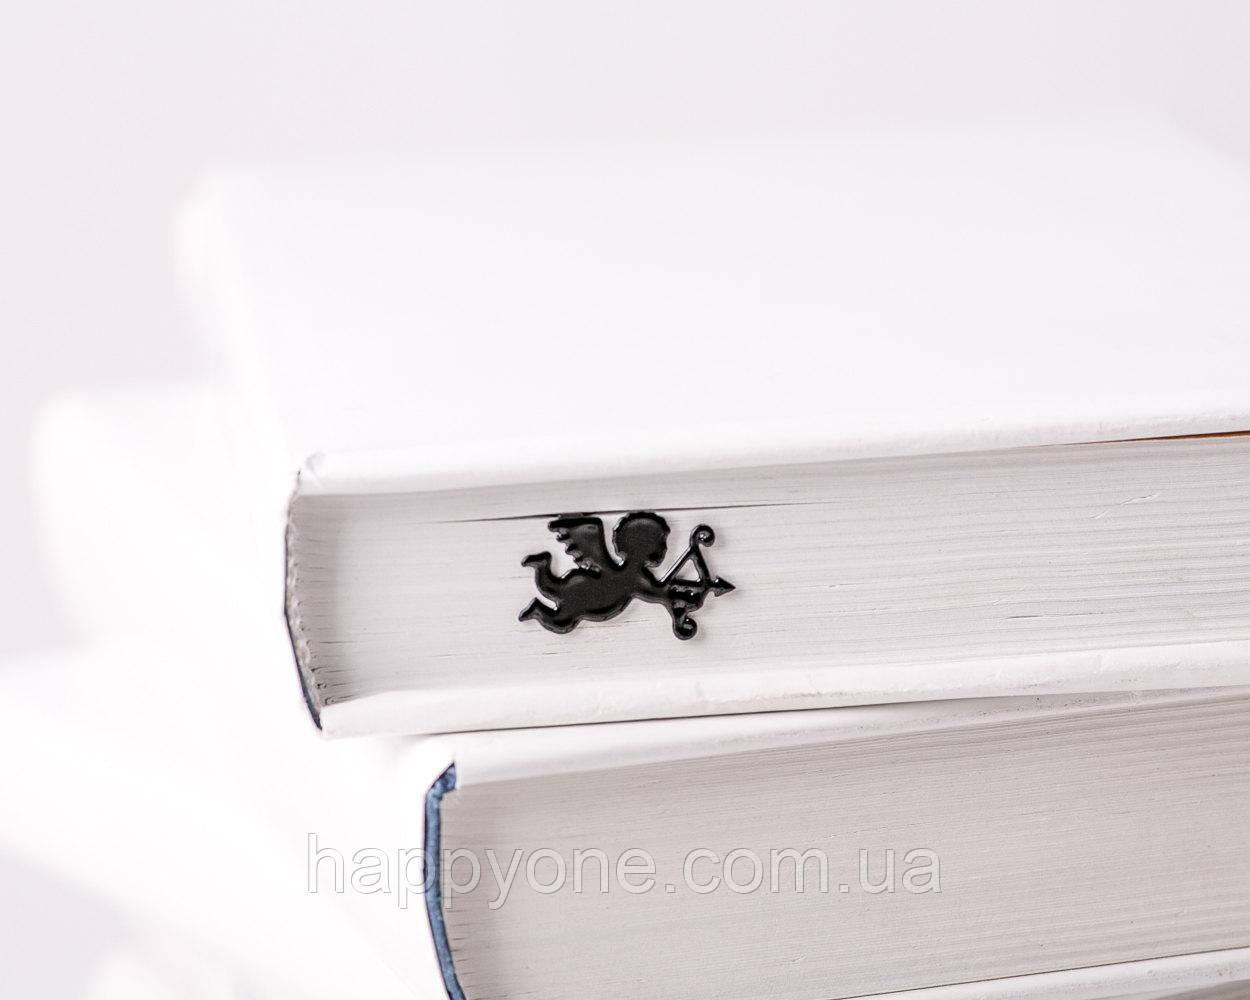 Закладка для книг Купидон